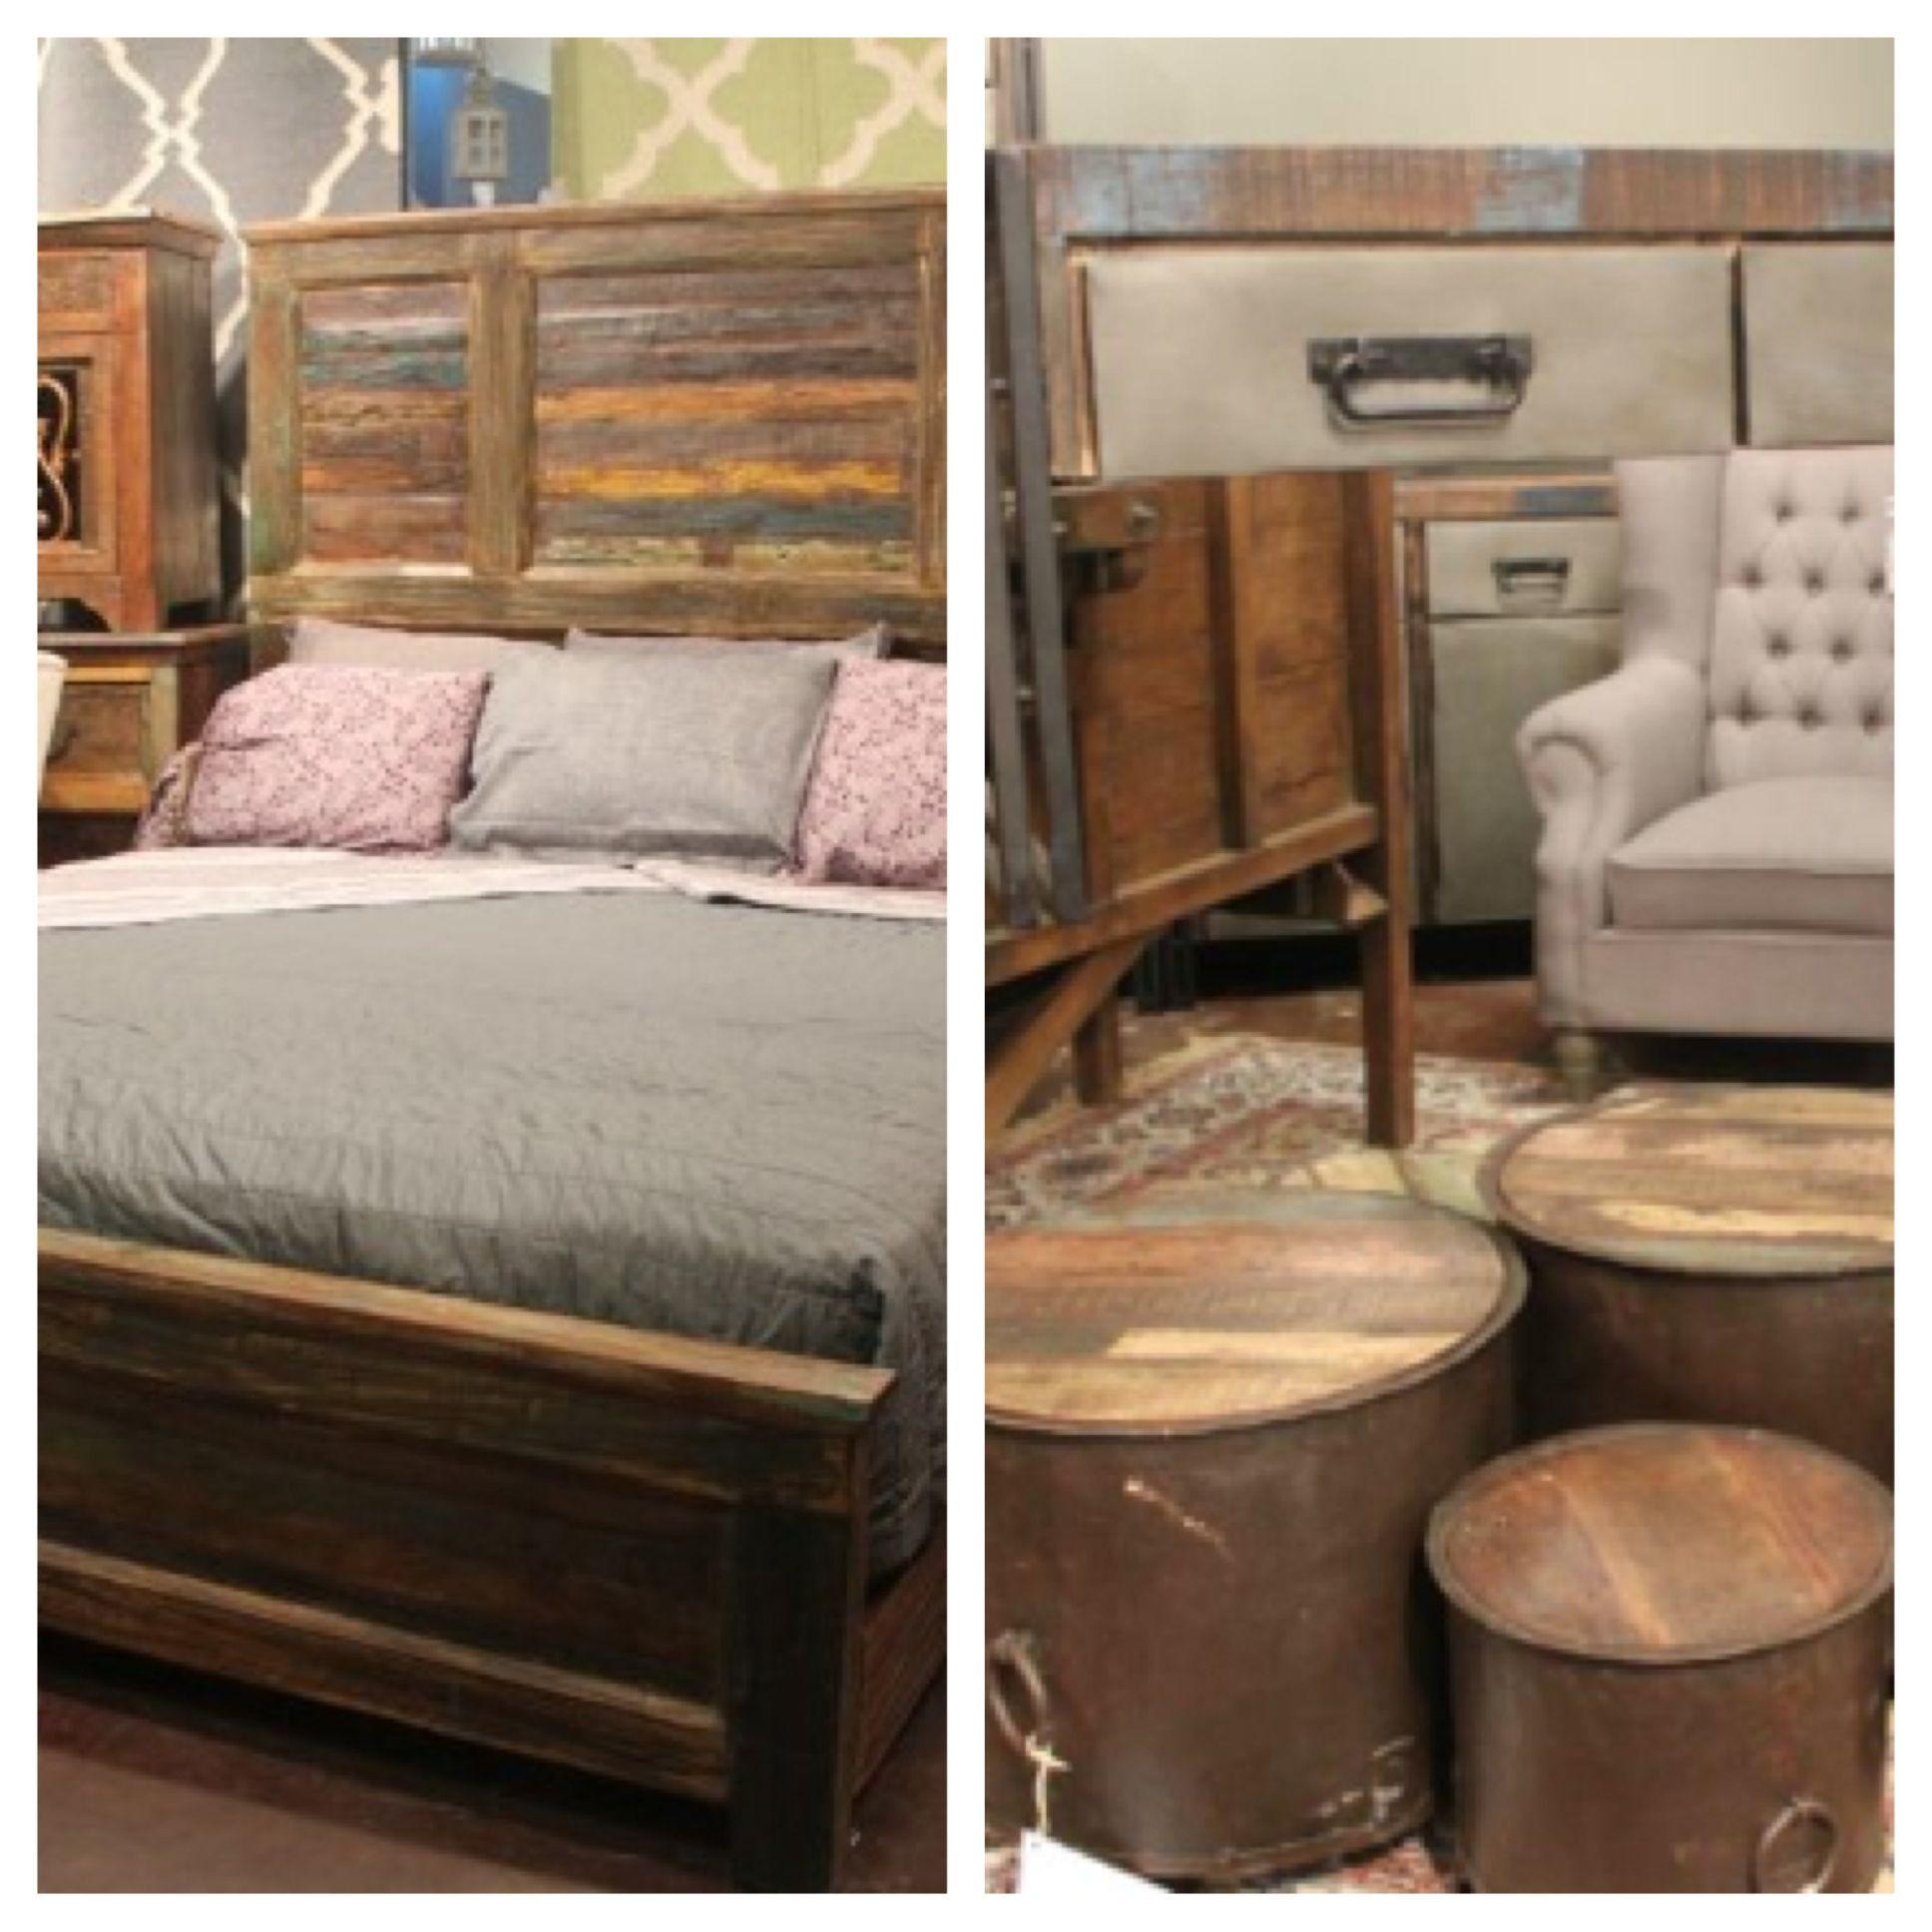 Cozy guest bedroom #guestroom #friendly #welcoming #enjoythestay